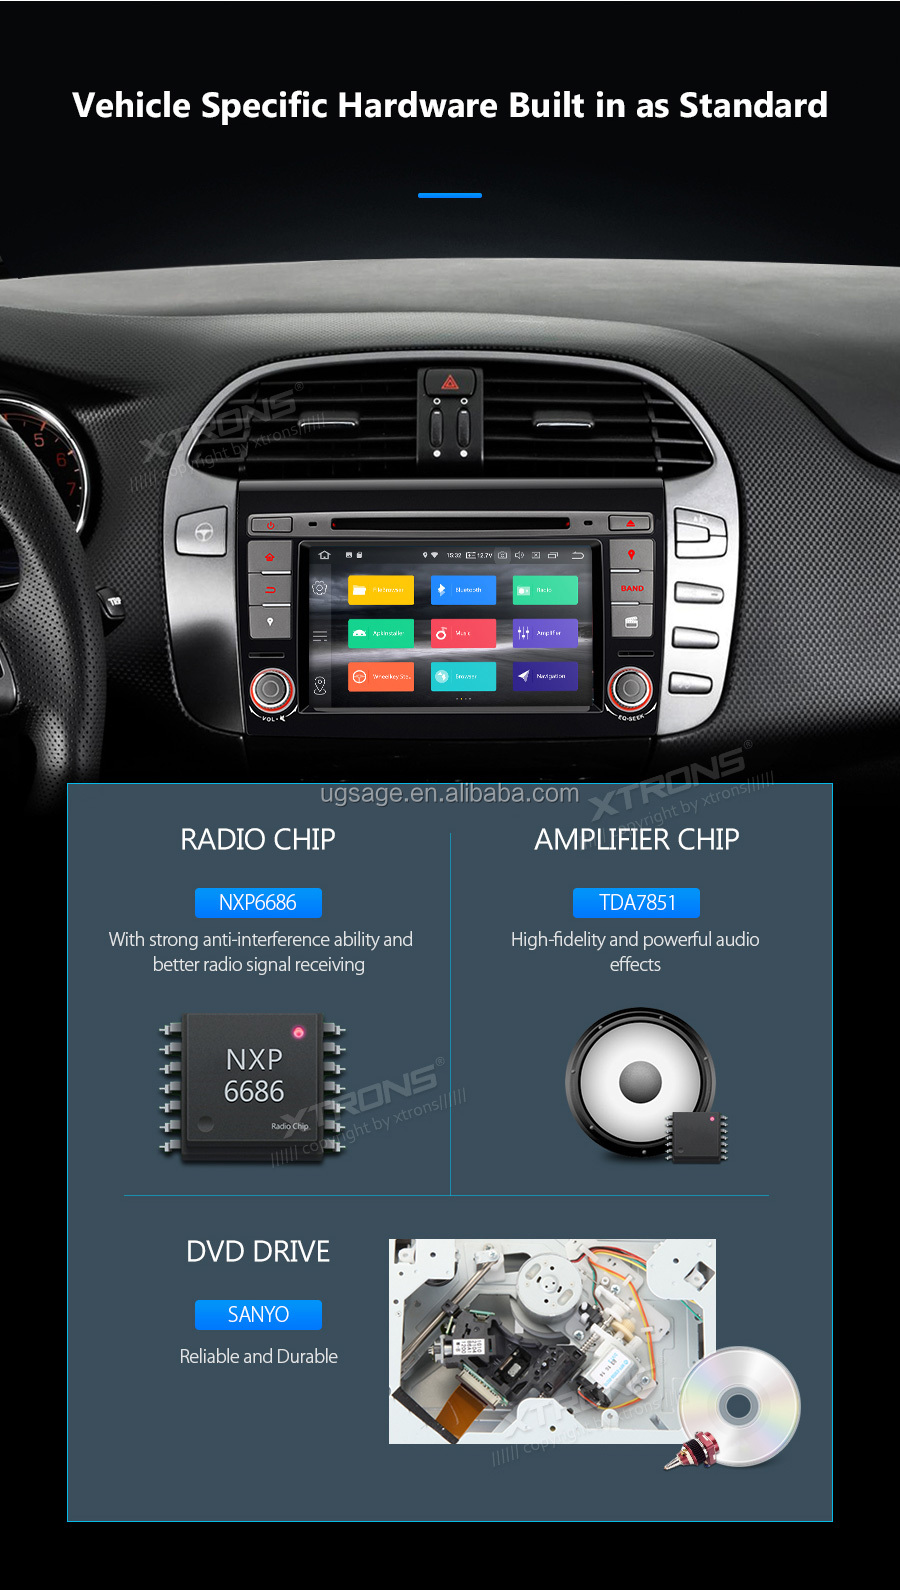 Xtrons 7 Polegadas Android 10 0 Sistema De Navegacao Do Gps Do Carro Para Fiat Bravo Com 4g Wifi Obd Ii Radio Voiture Buy Android Multimidia Carro Gps Carro Gps Paragrafos Perros Product On Alibaba Com